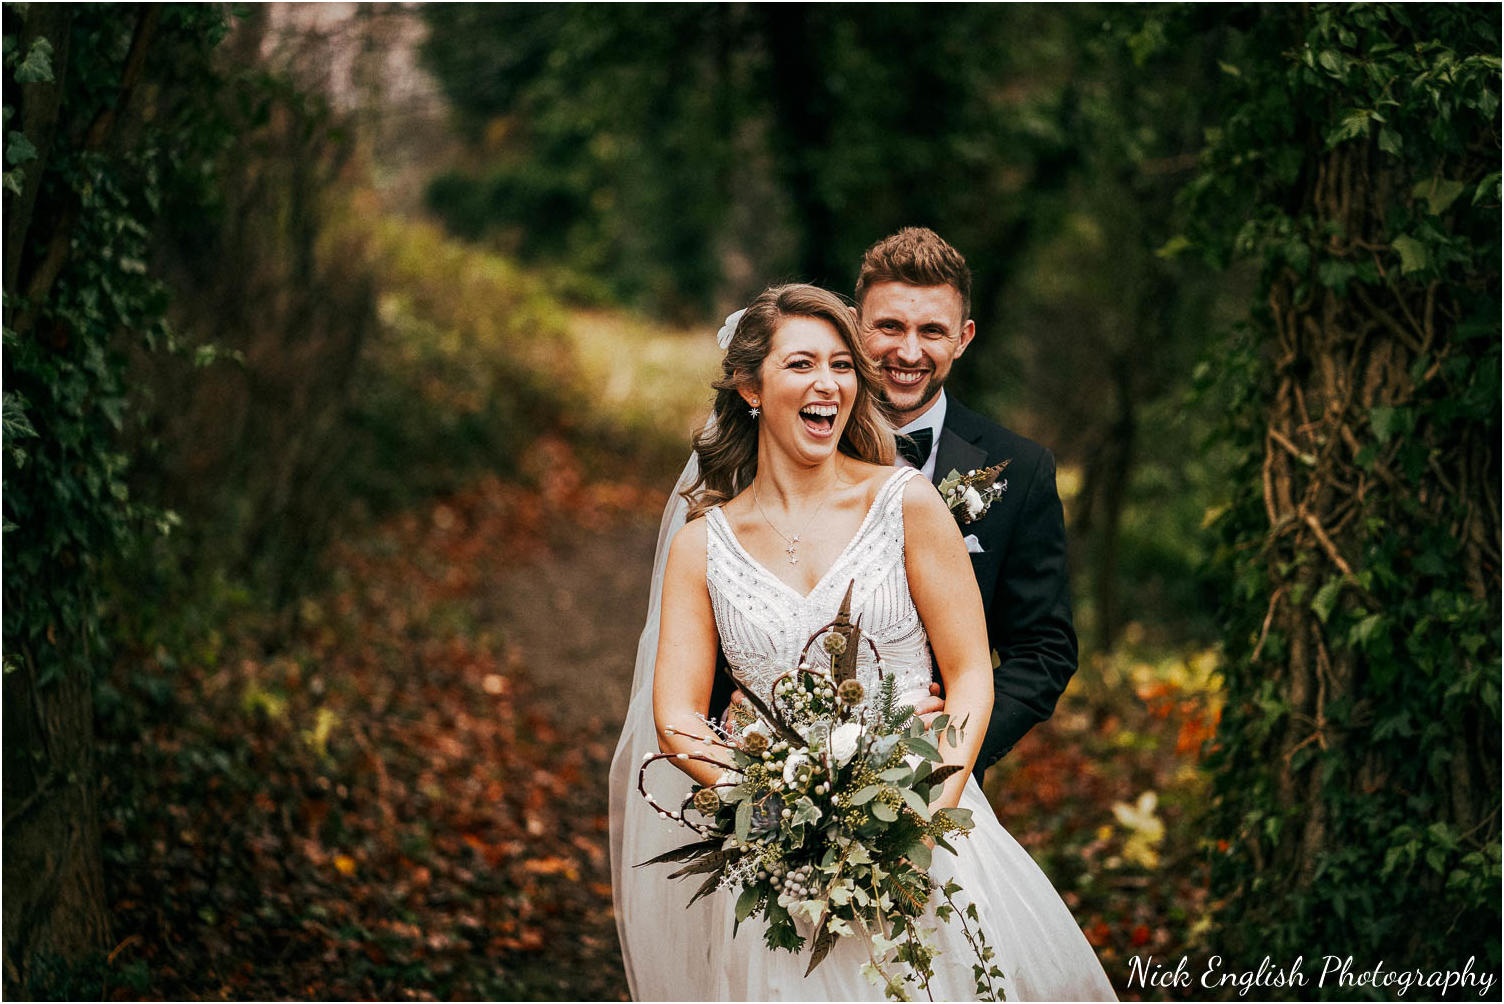 Mitton_Hall_Christmas_Winter_Wedding-56.jpg